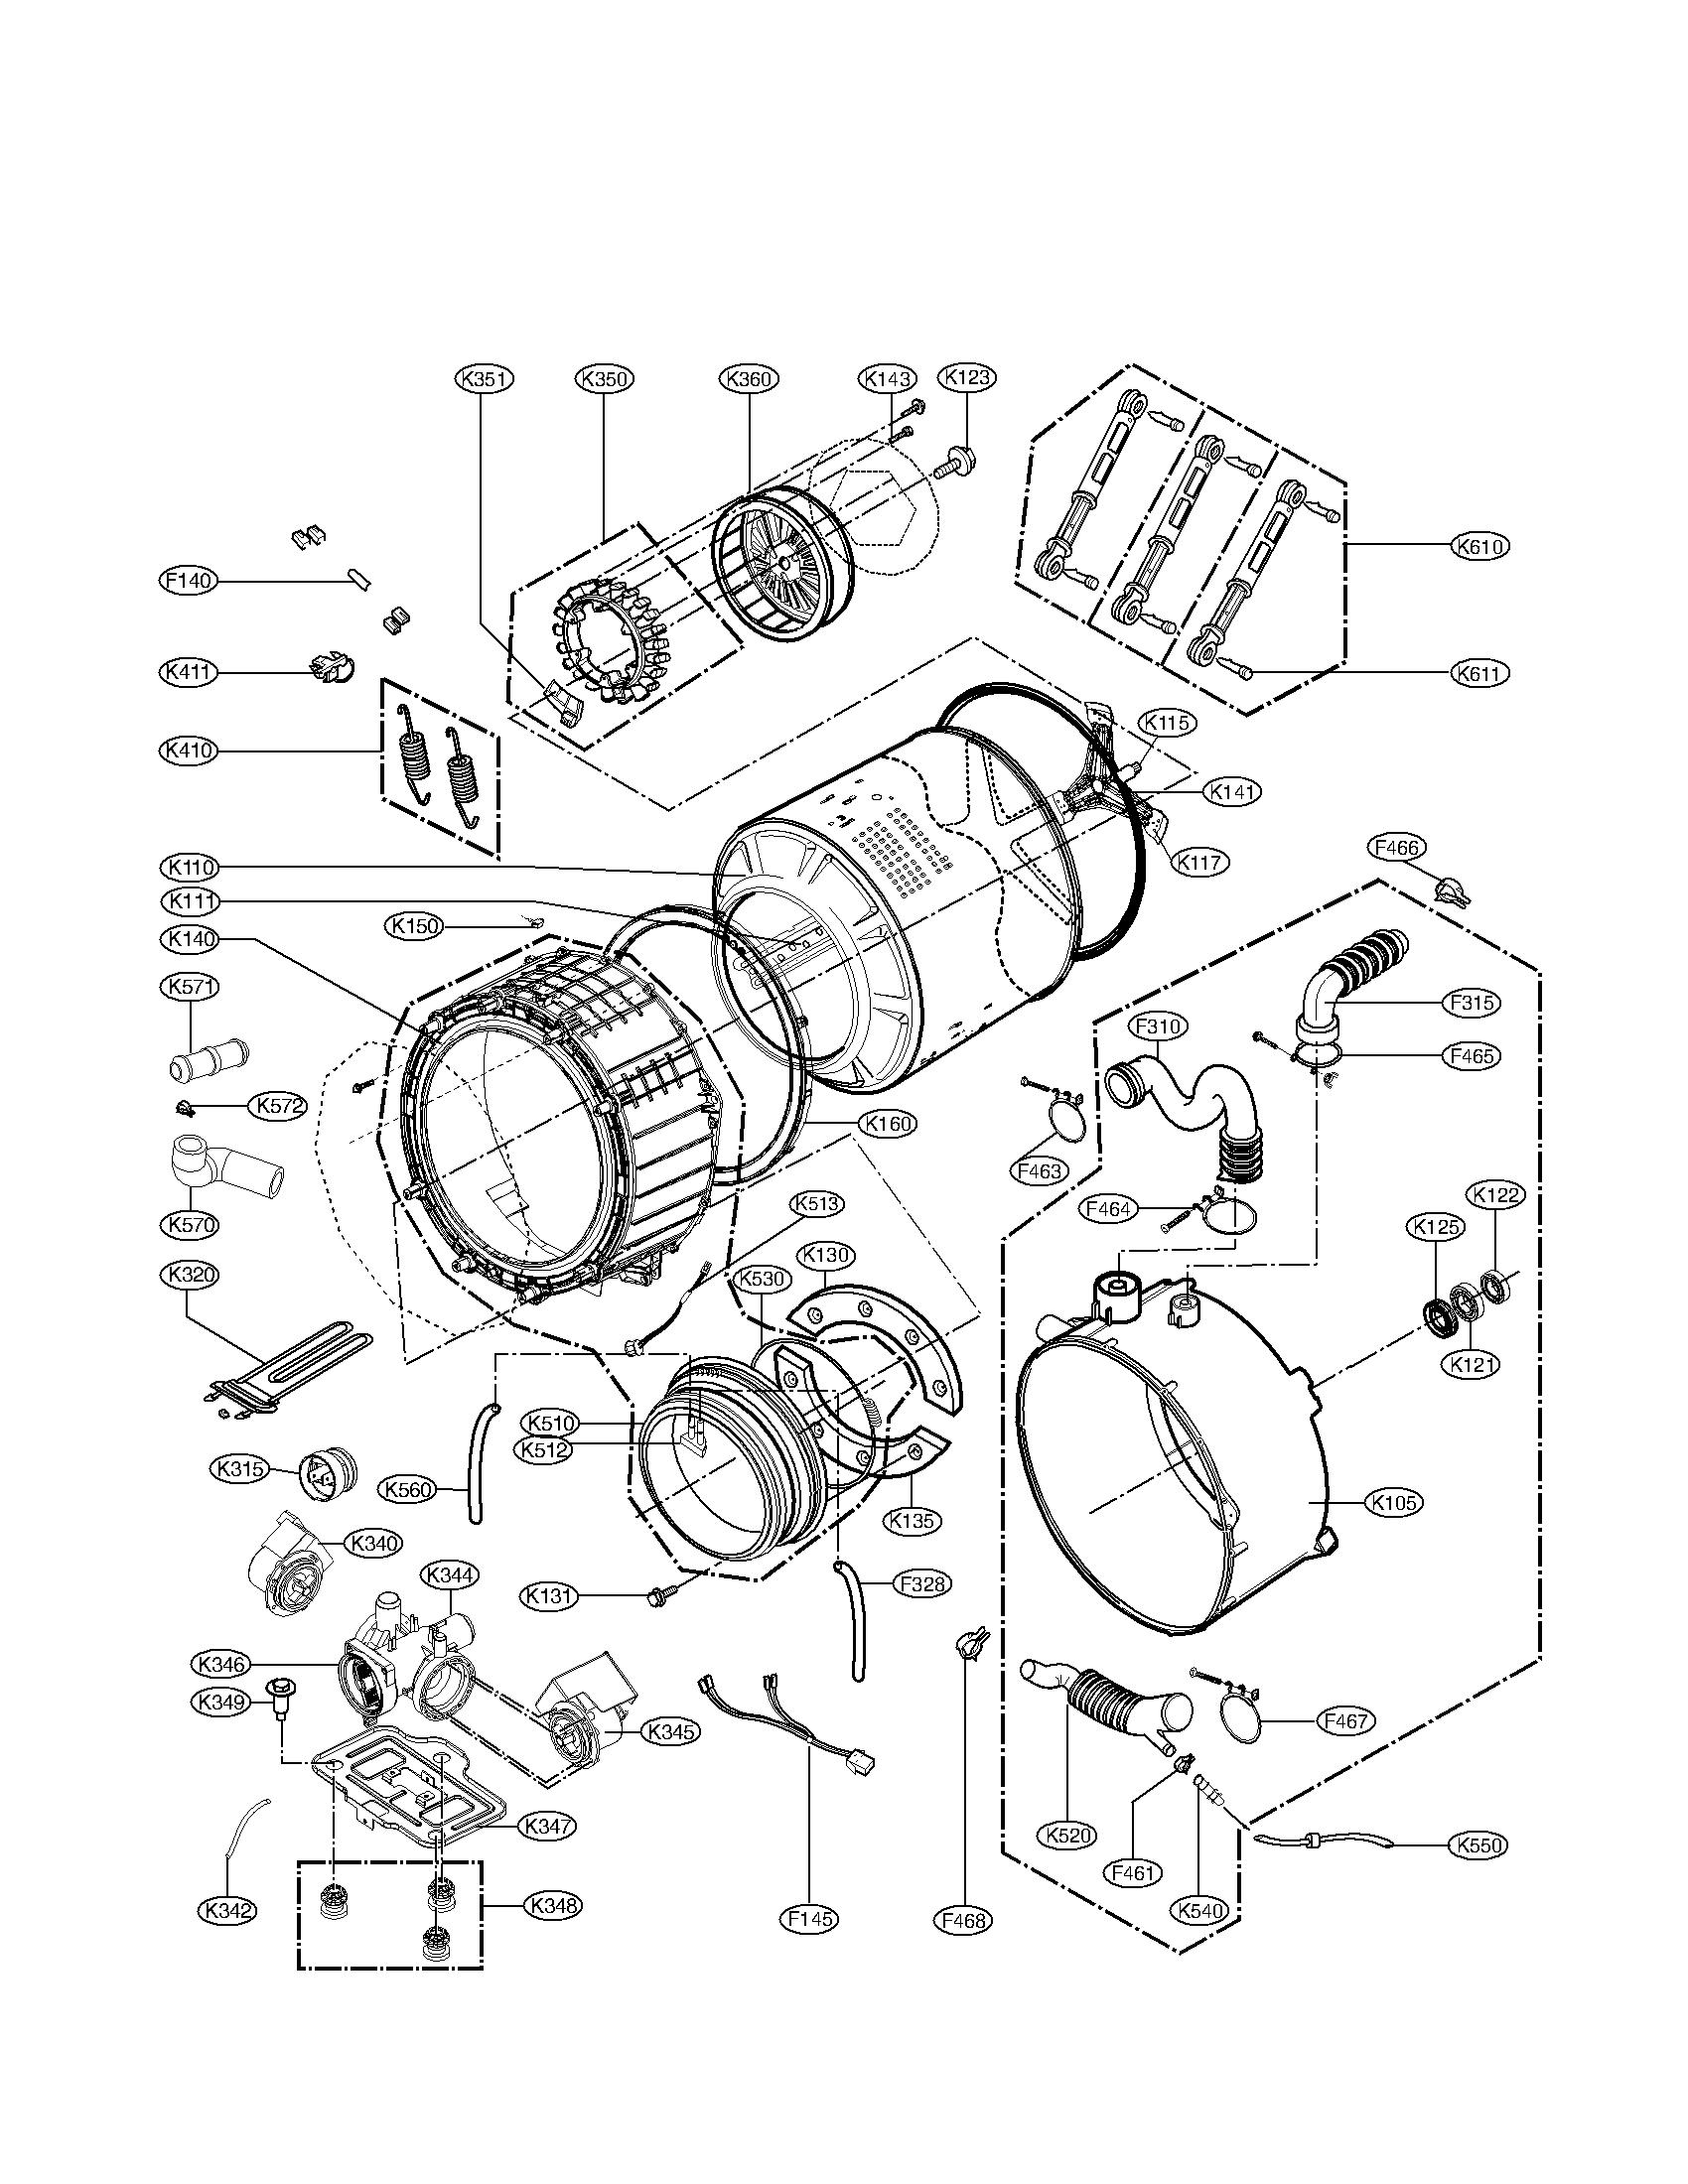 Kenmore Elite He3 Dryer Parts Diagram on electric dryer wiring diagram, kenmore stackable dryer wiring diagram, whirlpool duet dryer wiring diagram, kenmore elite oasis dryer wiring diagram,